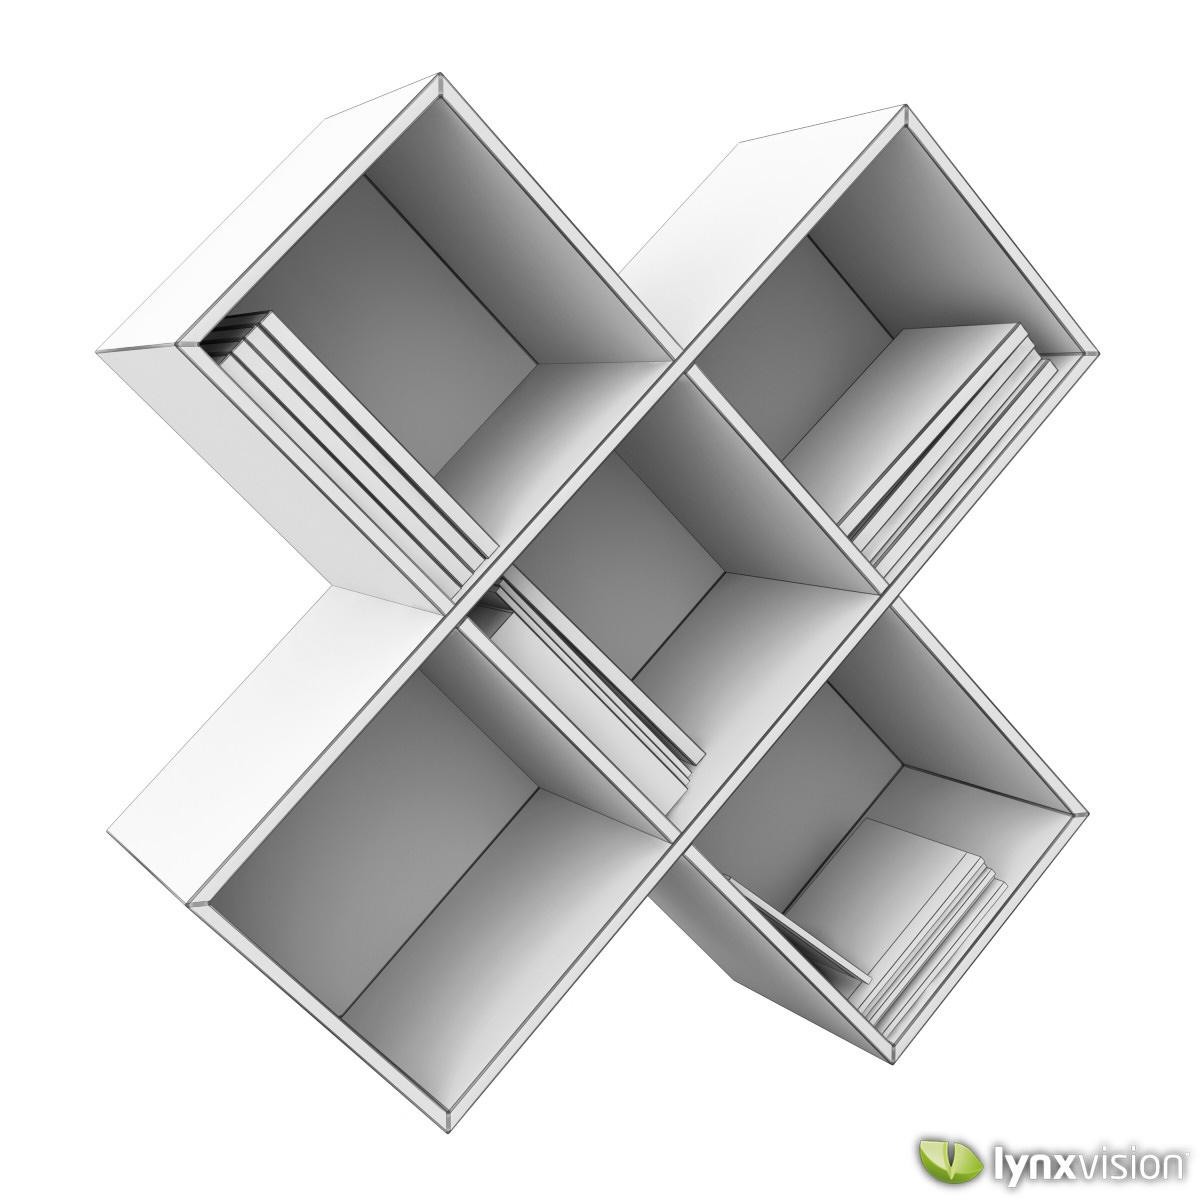 ... dark wood cd-dvd rack 3d model max obj fbx 4 ...  sc 1 st  CGTrader & Dark Wood CD-DVD Rack 3D model   CGTrader